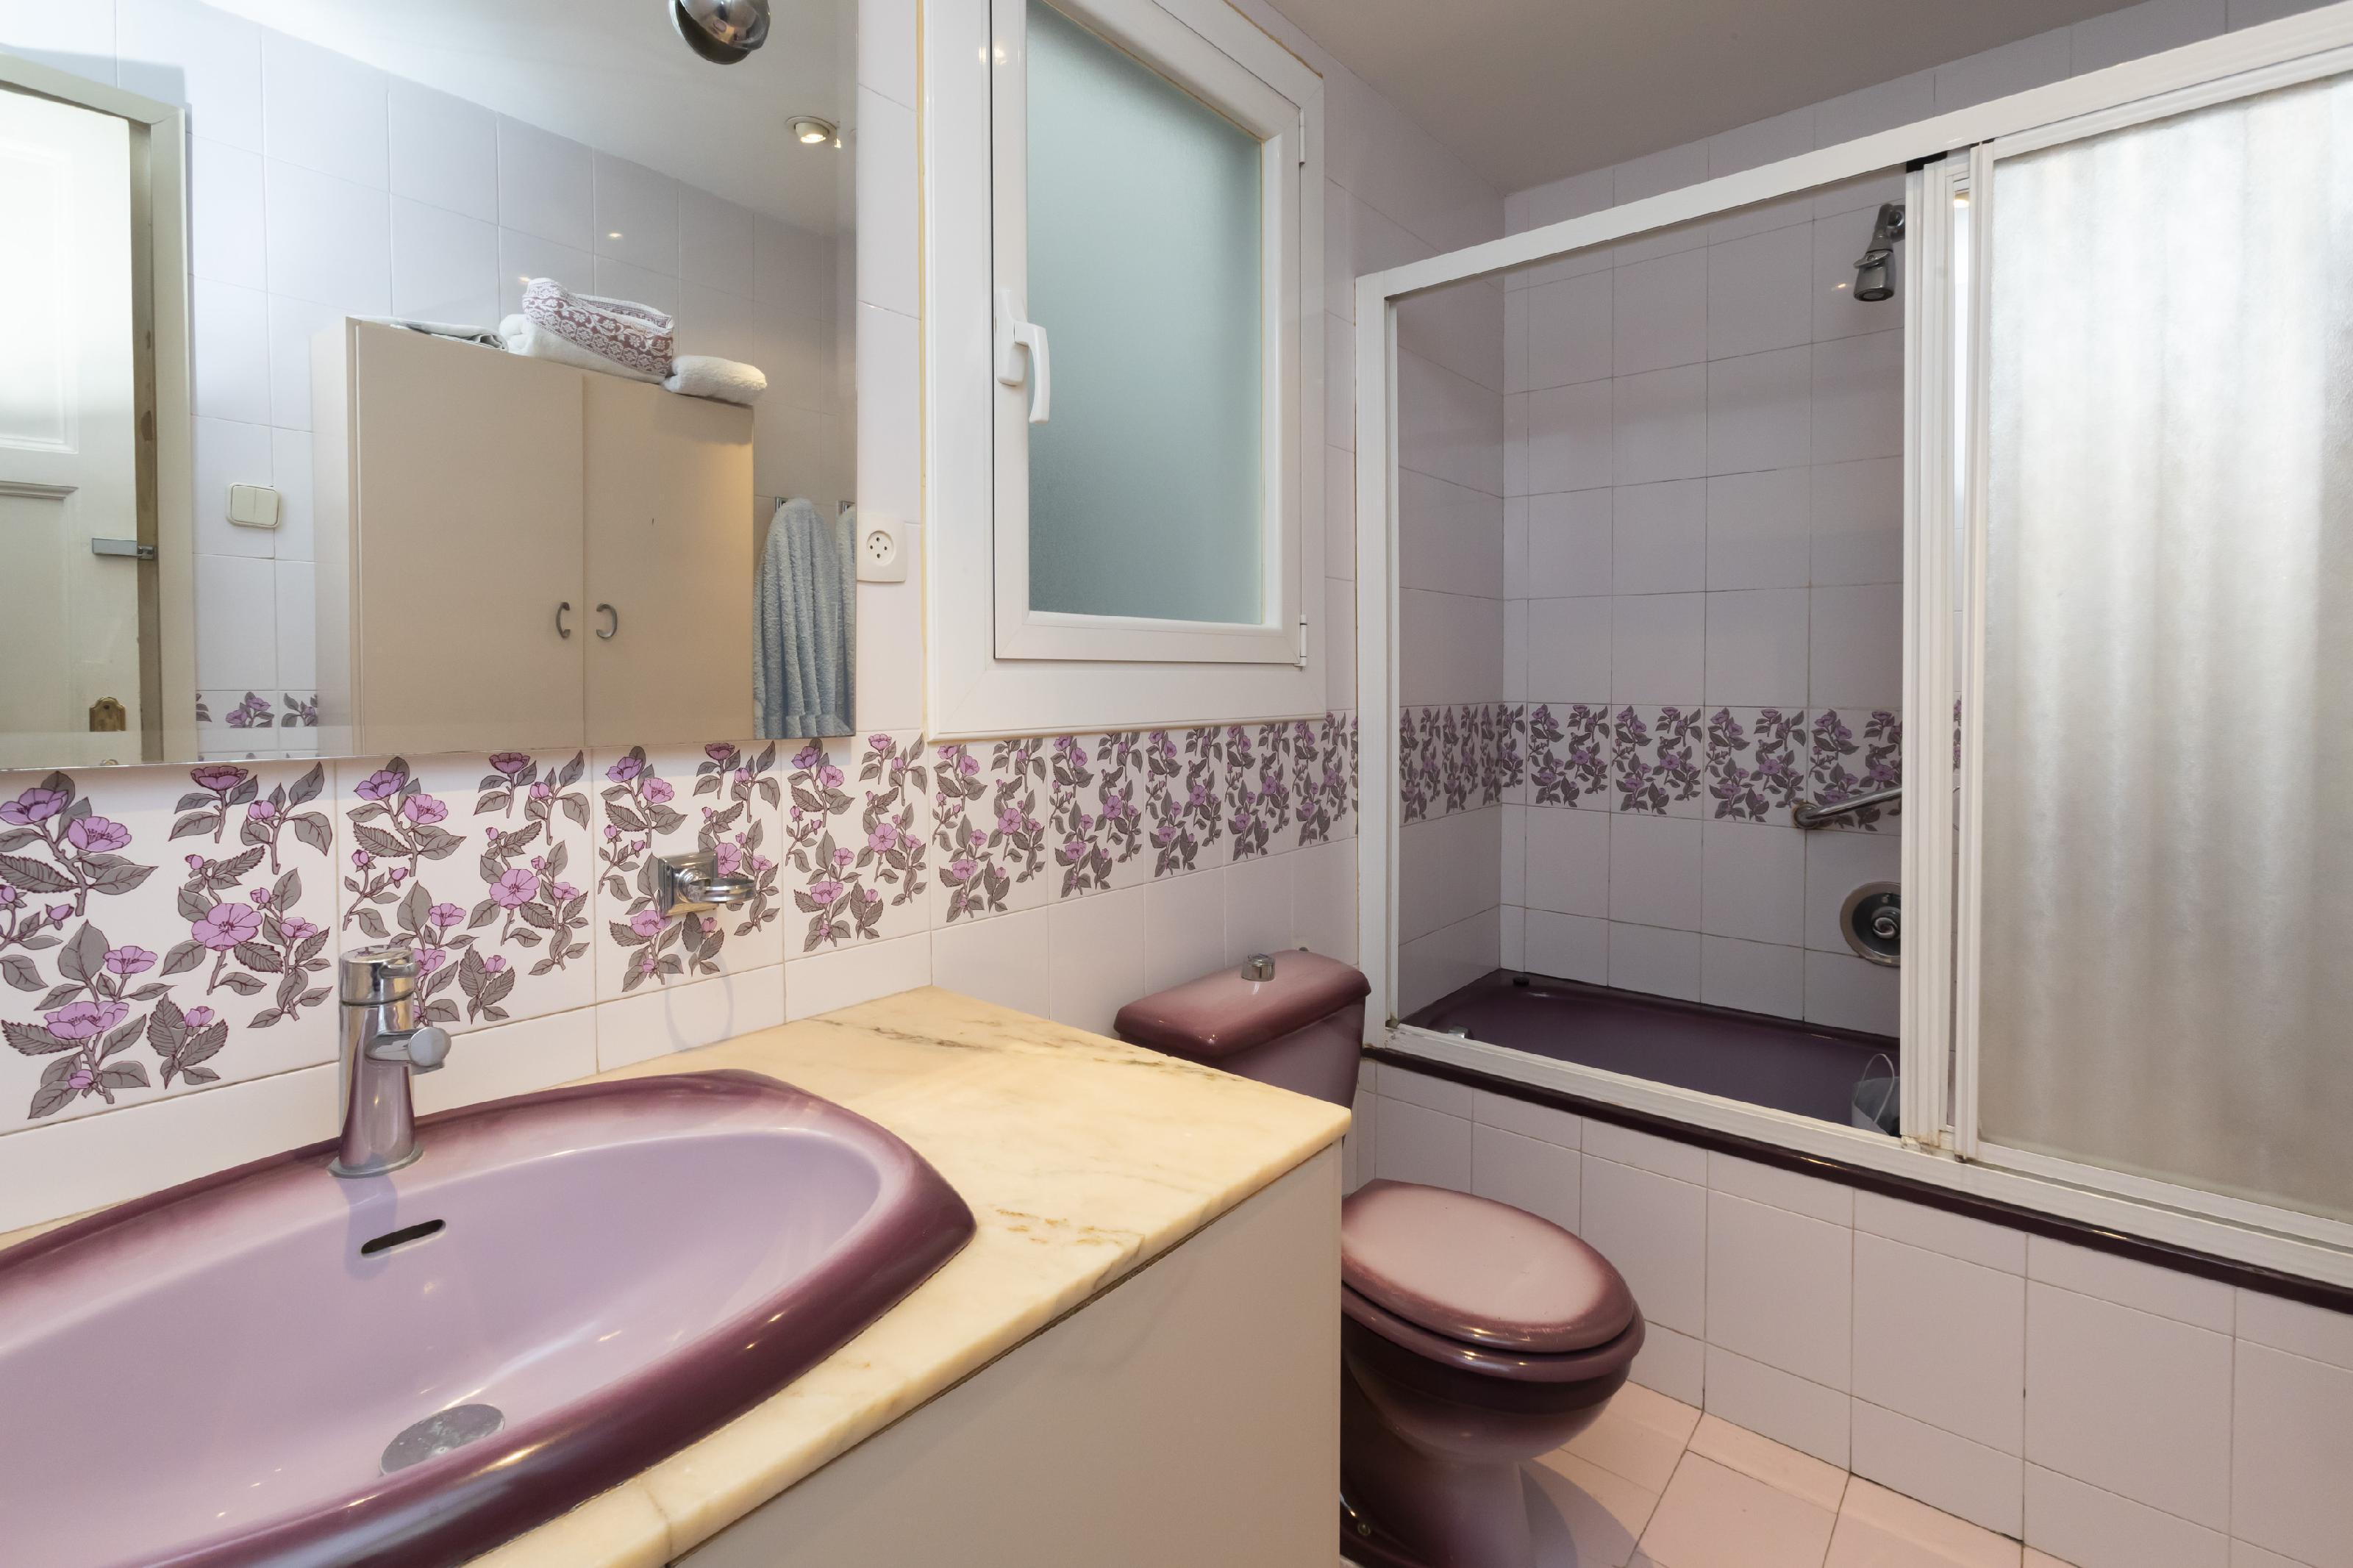 247097 Flat for sale in Sarrià-Sant Gervasi, Sant Gervasi-Galvany 28